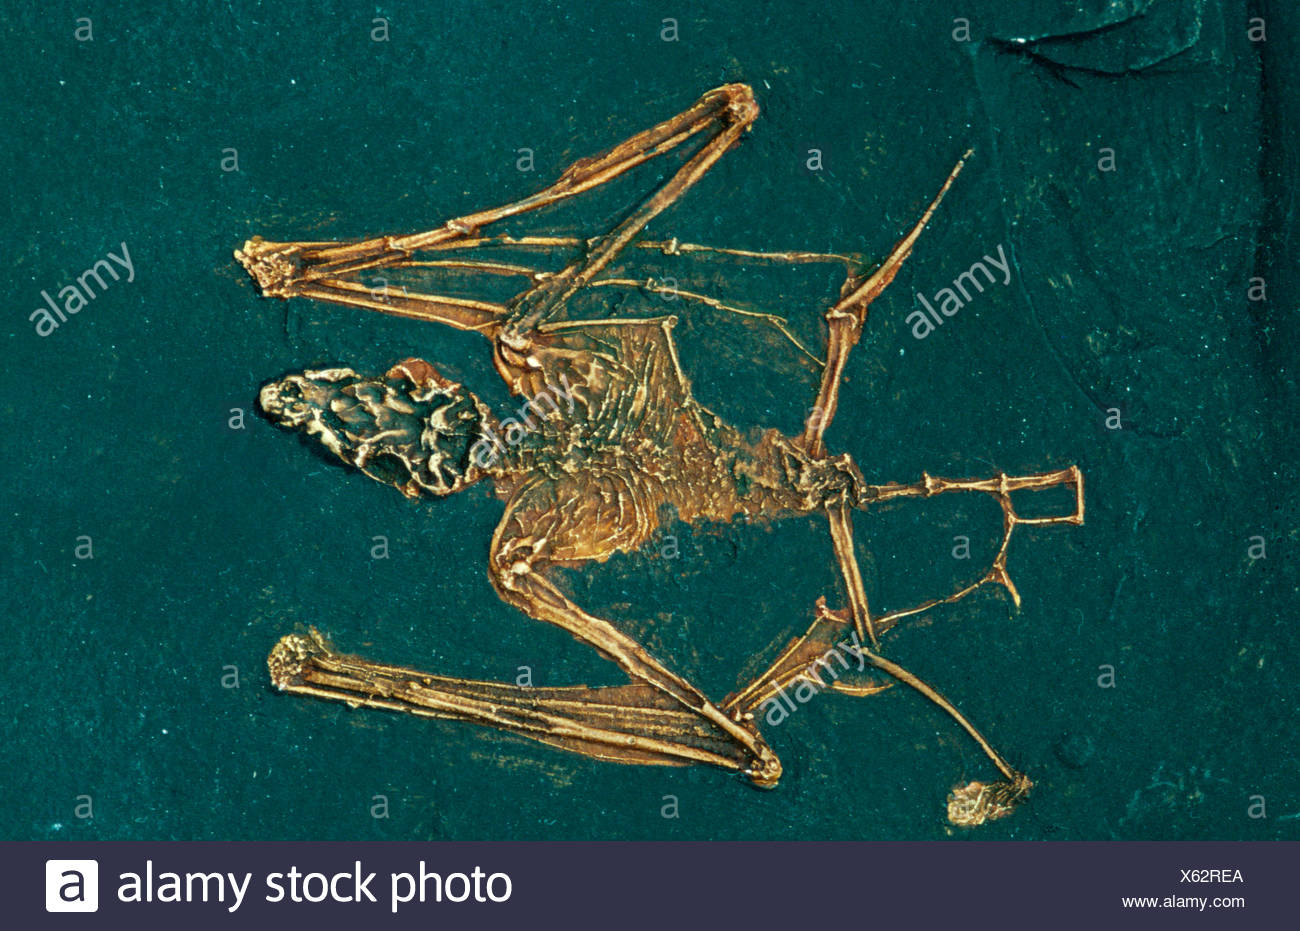 Fossil Bat - Stock Image